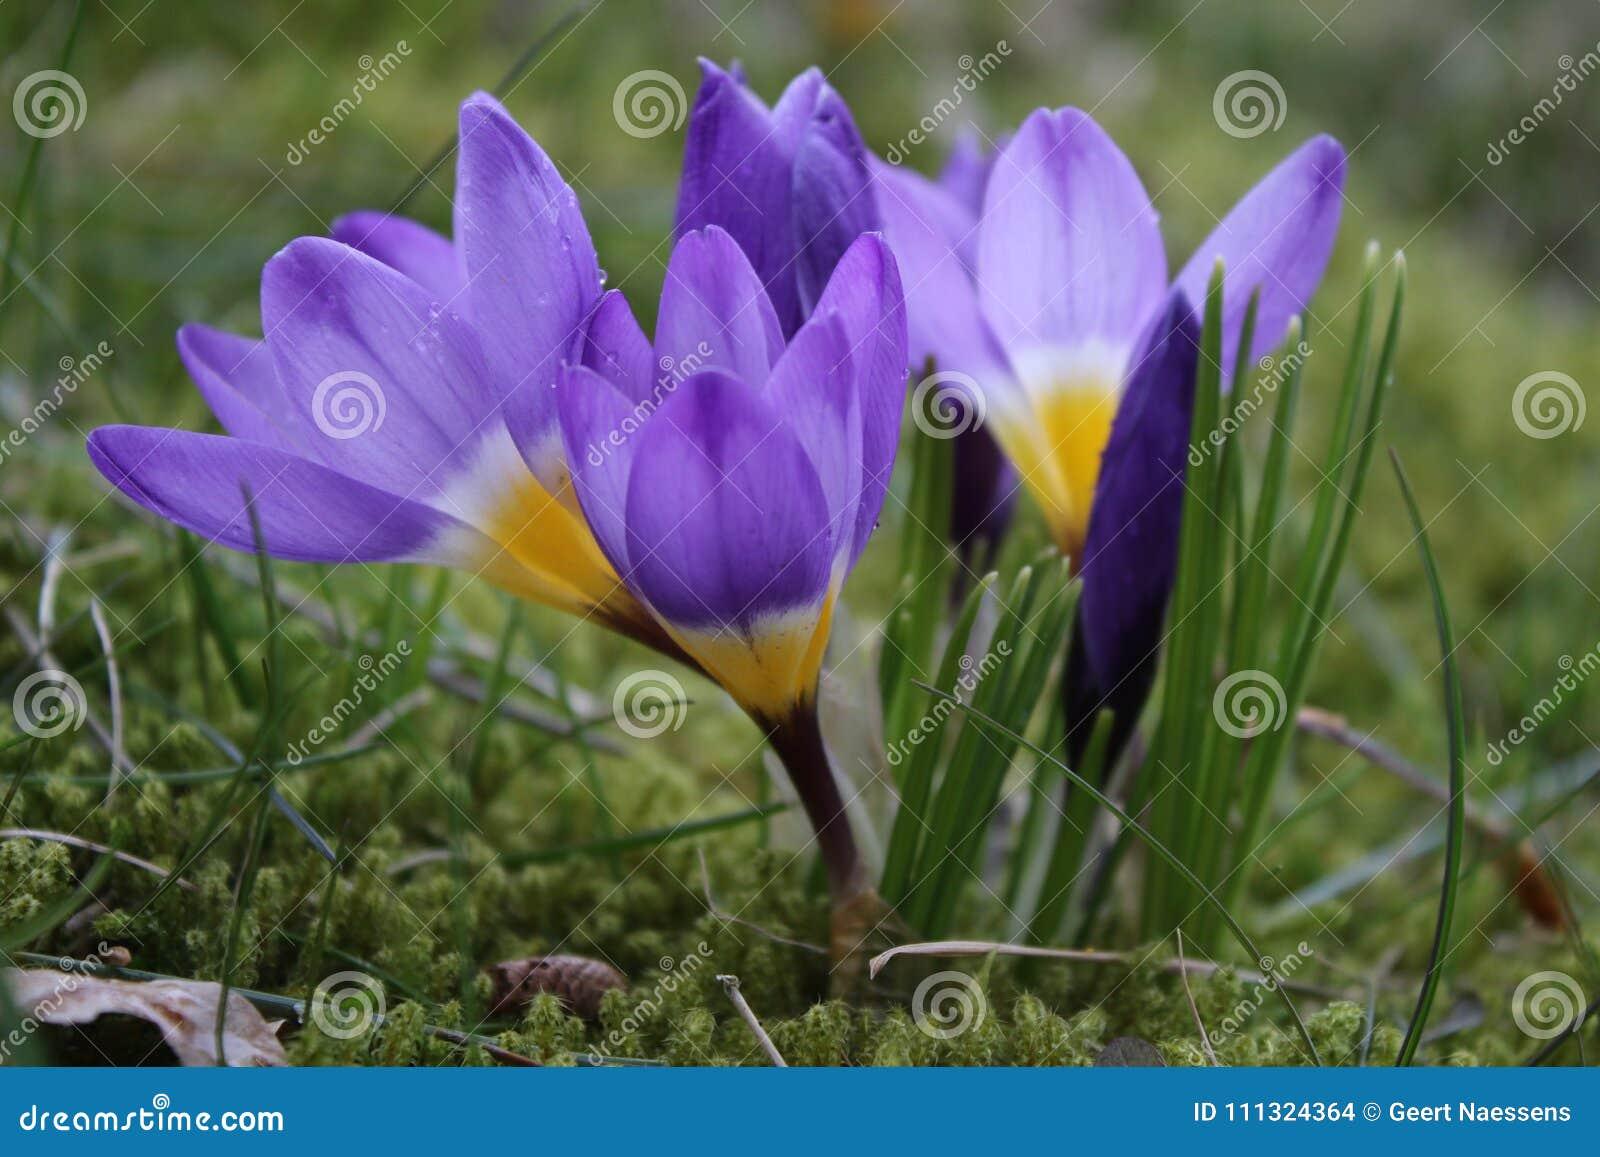 Flowering Purple Crocus Sieberii Tricolor In Spring Stock Photo ...